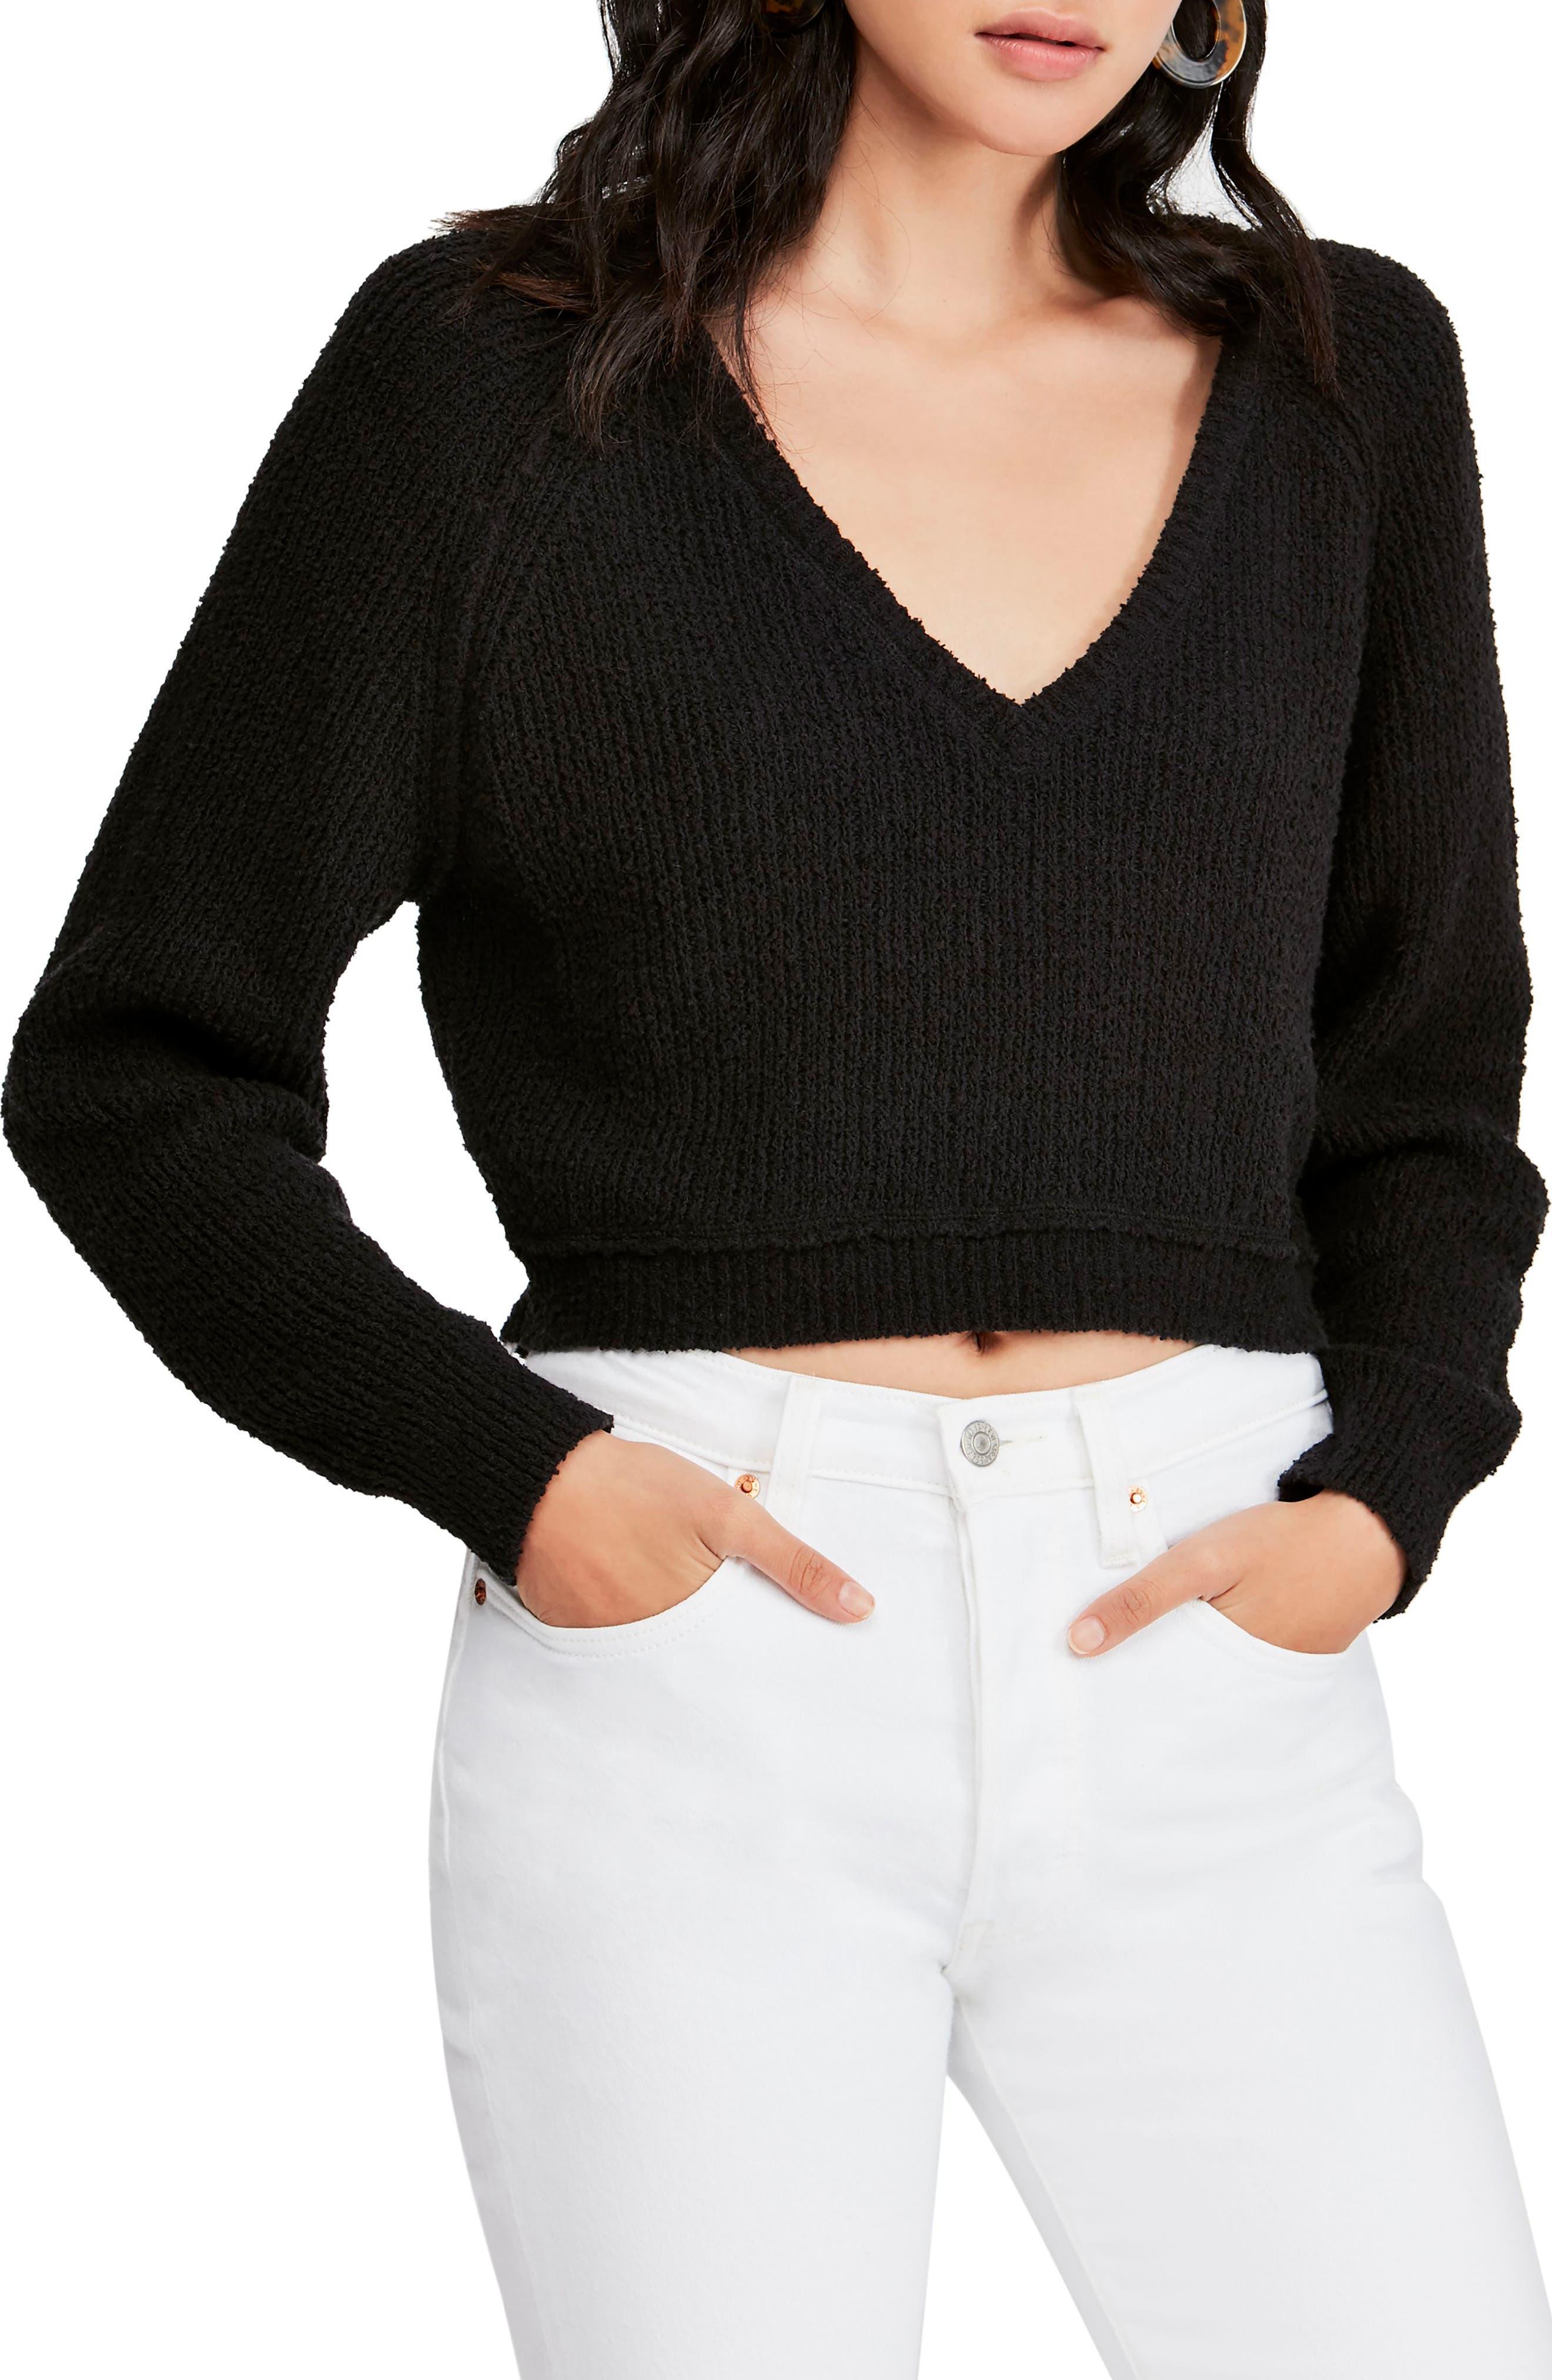 FREE PEOPLE,                             V-Neck Sweater,                             Main thumbnail 1, color,                             BLACK